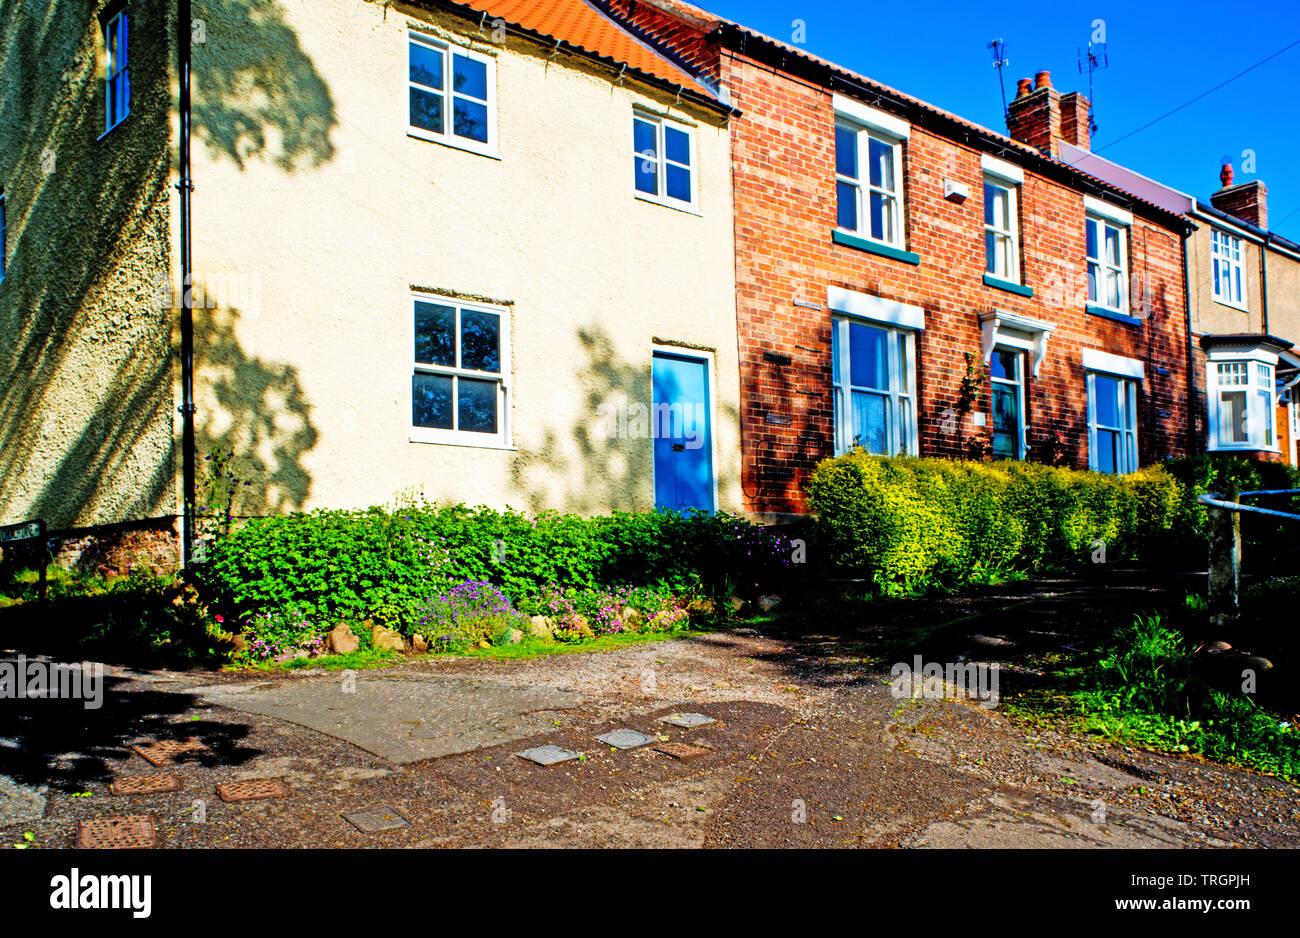 Middleton Road, Sadberge, Borough of Darlington, England Stock Photo